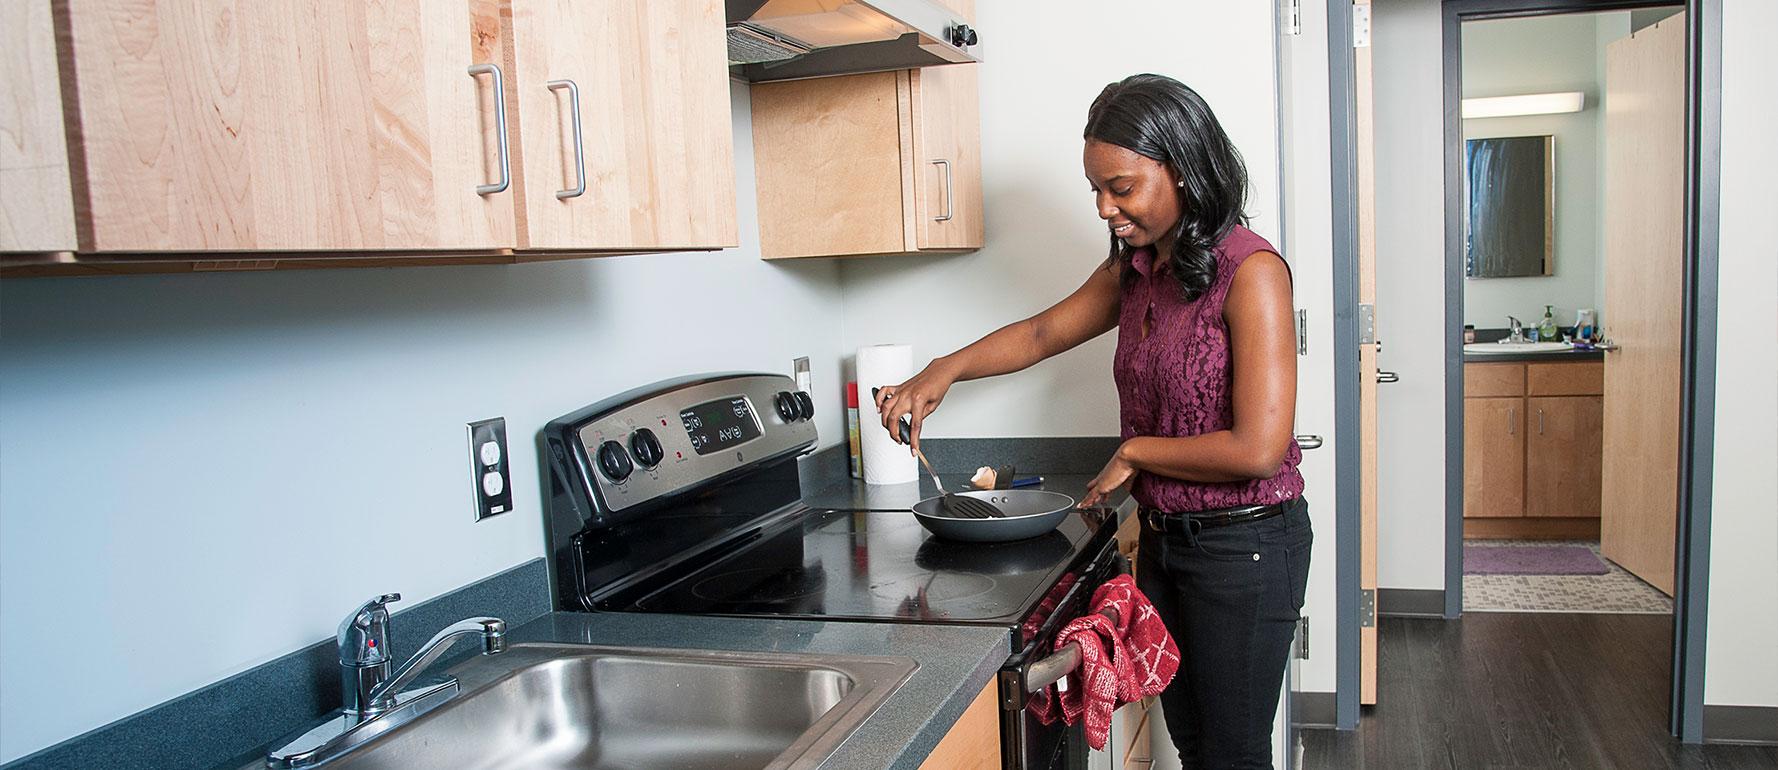 Housing-HERO-kitchen